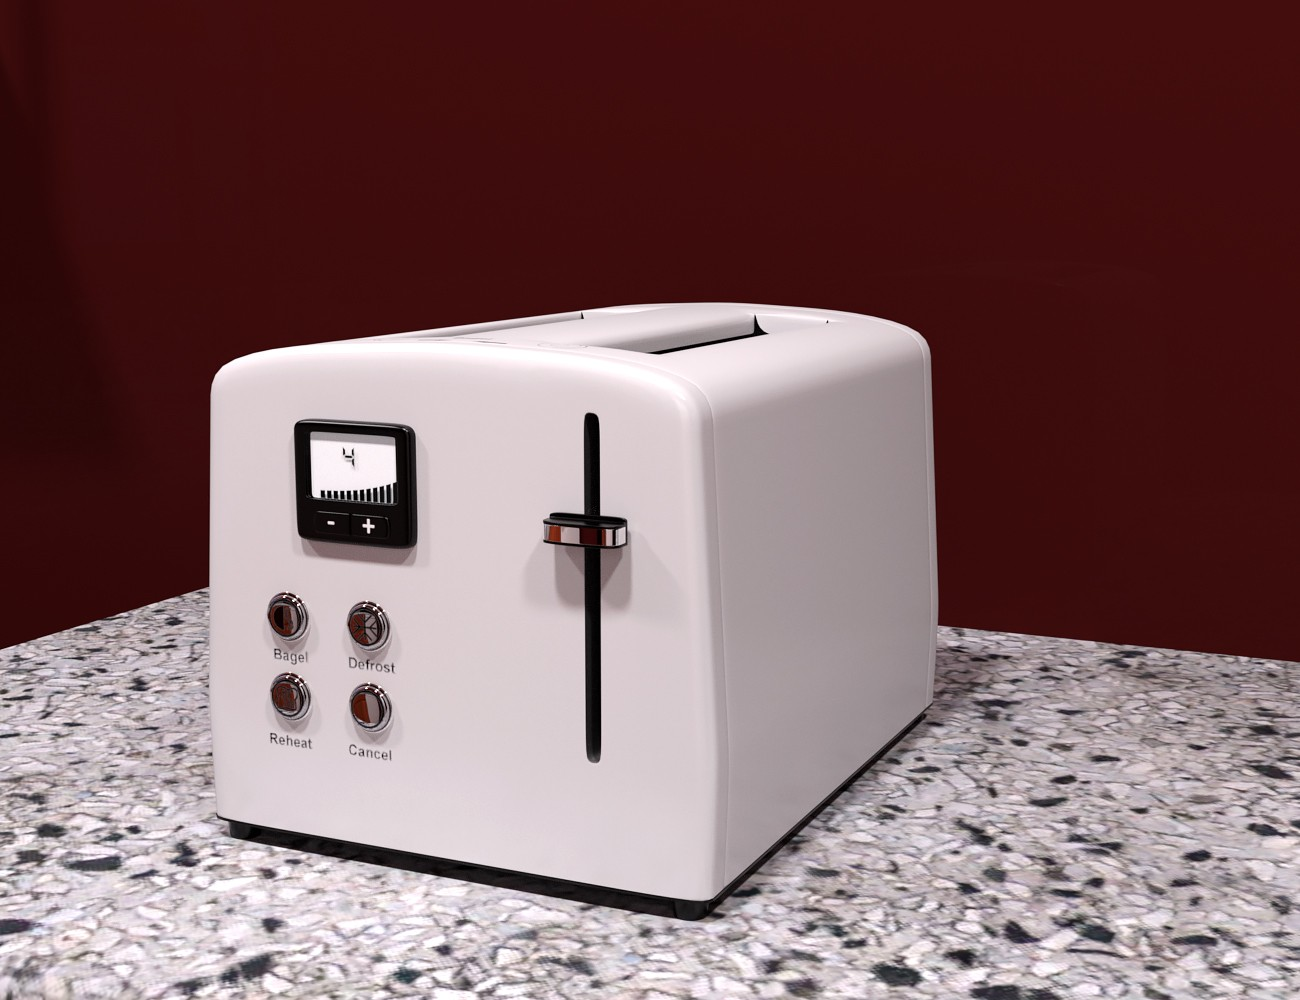 Small Kitchen Appliances Sink Hose Download Daz Studio 3 For Free 3d